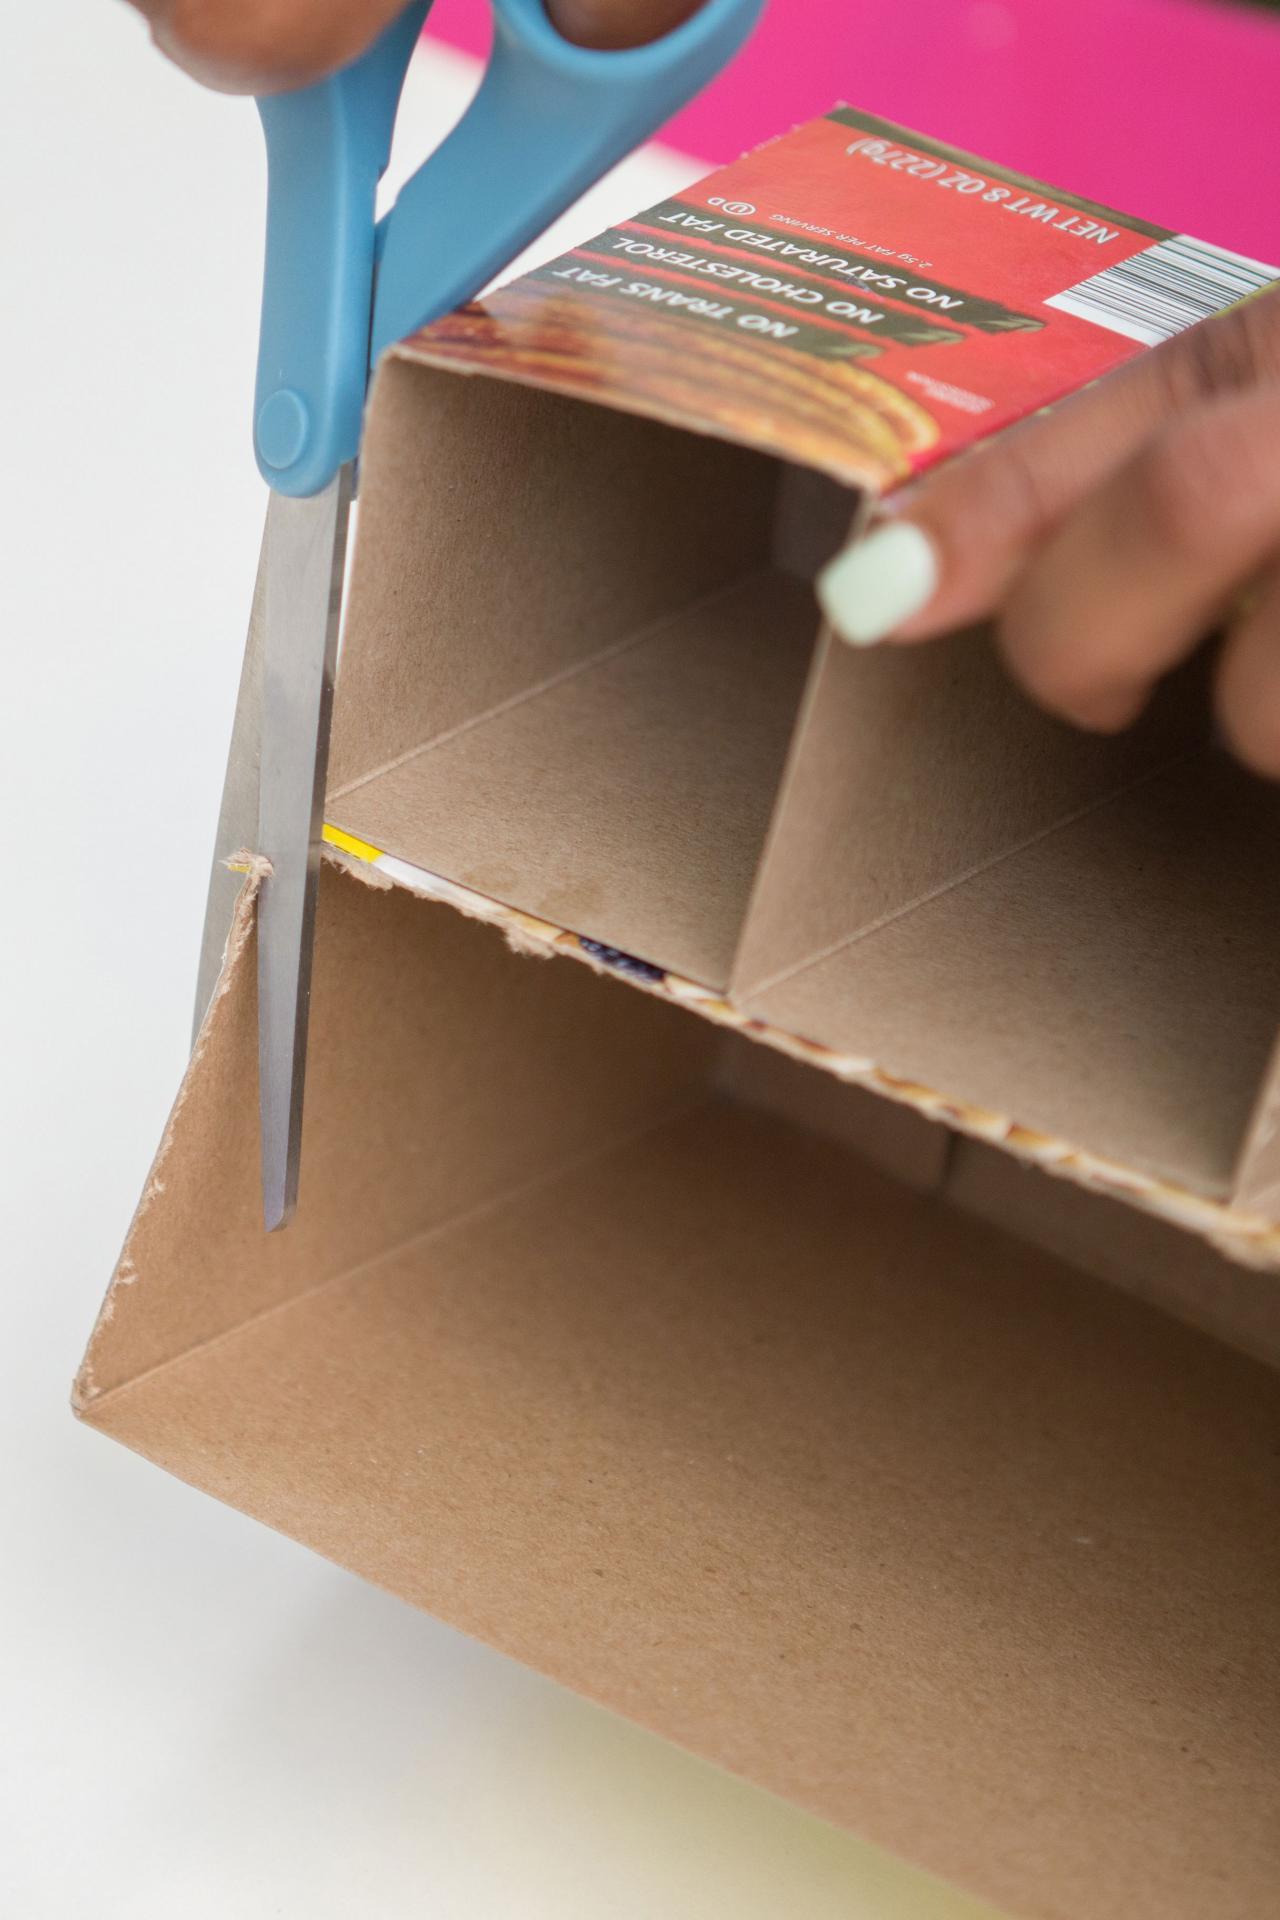 mag freshness by via desk standing foldable cardboard designboom refold